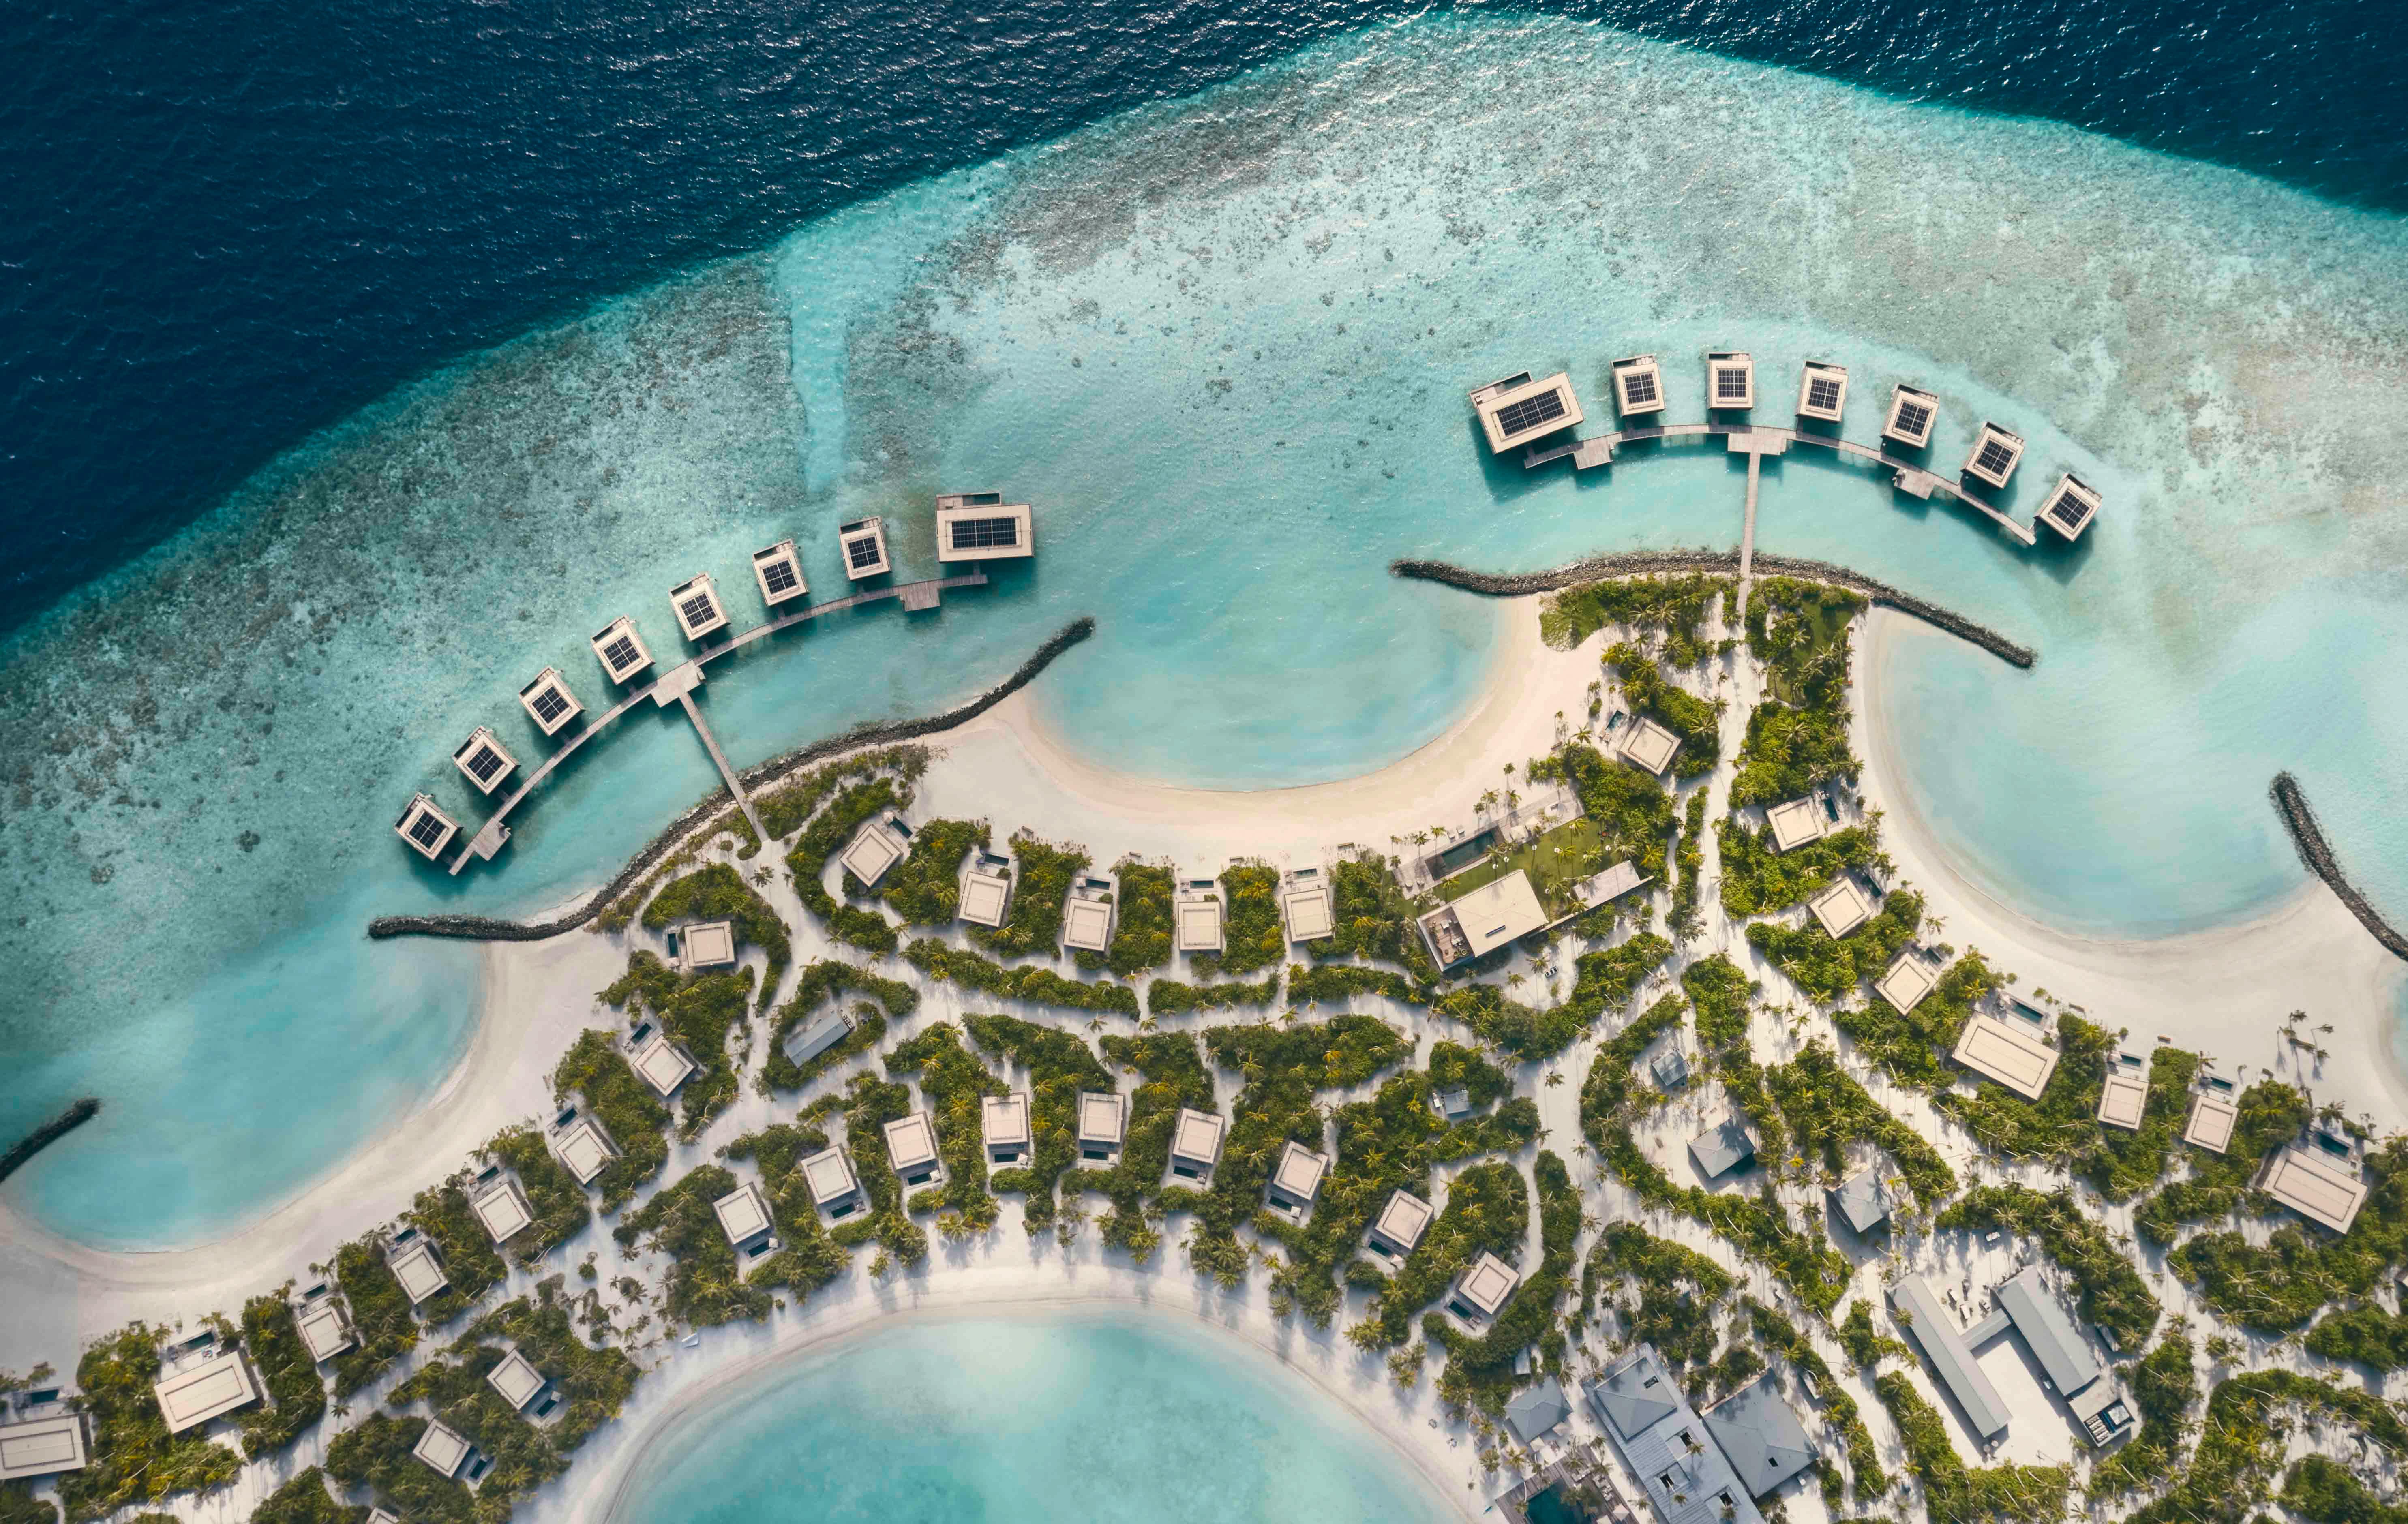 Patina Maldives, Fari Islands